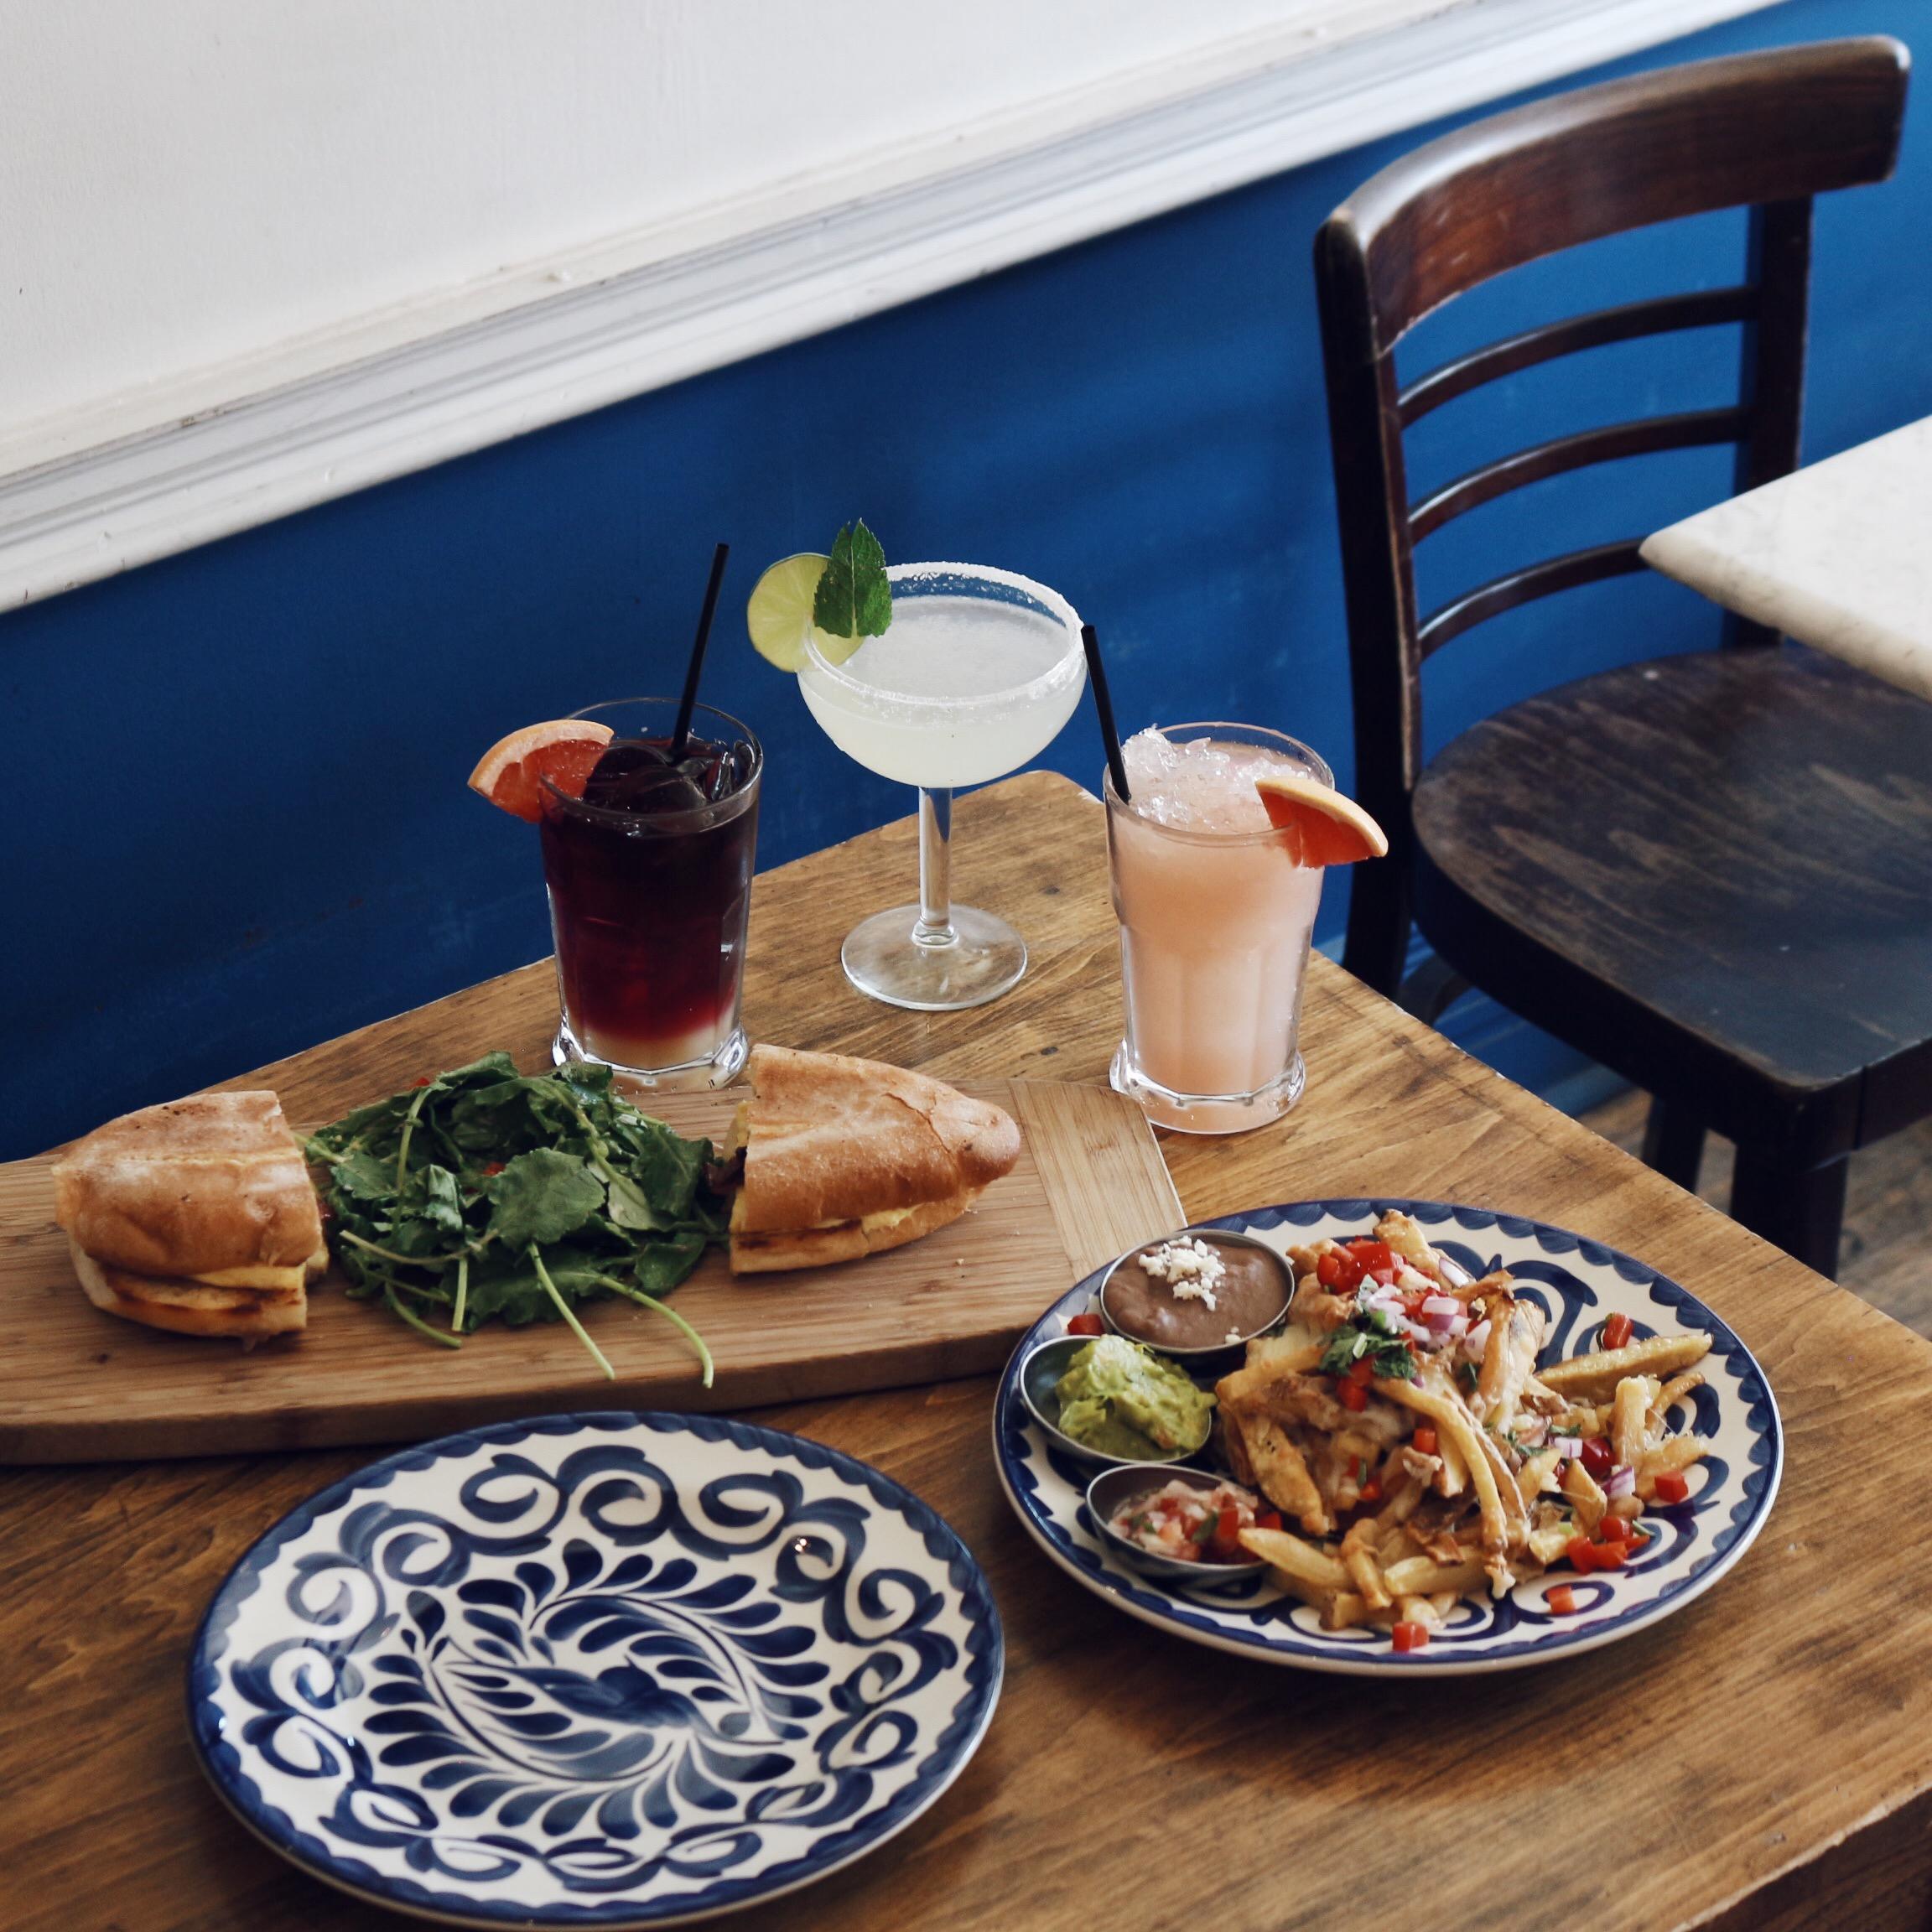 Fonda Lola  has phenomenal Instagram worthy dishes for those seeking good food and good pics! ;)